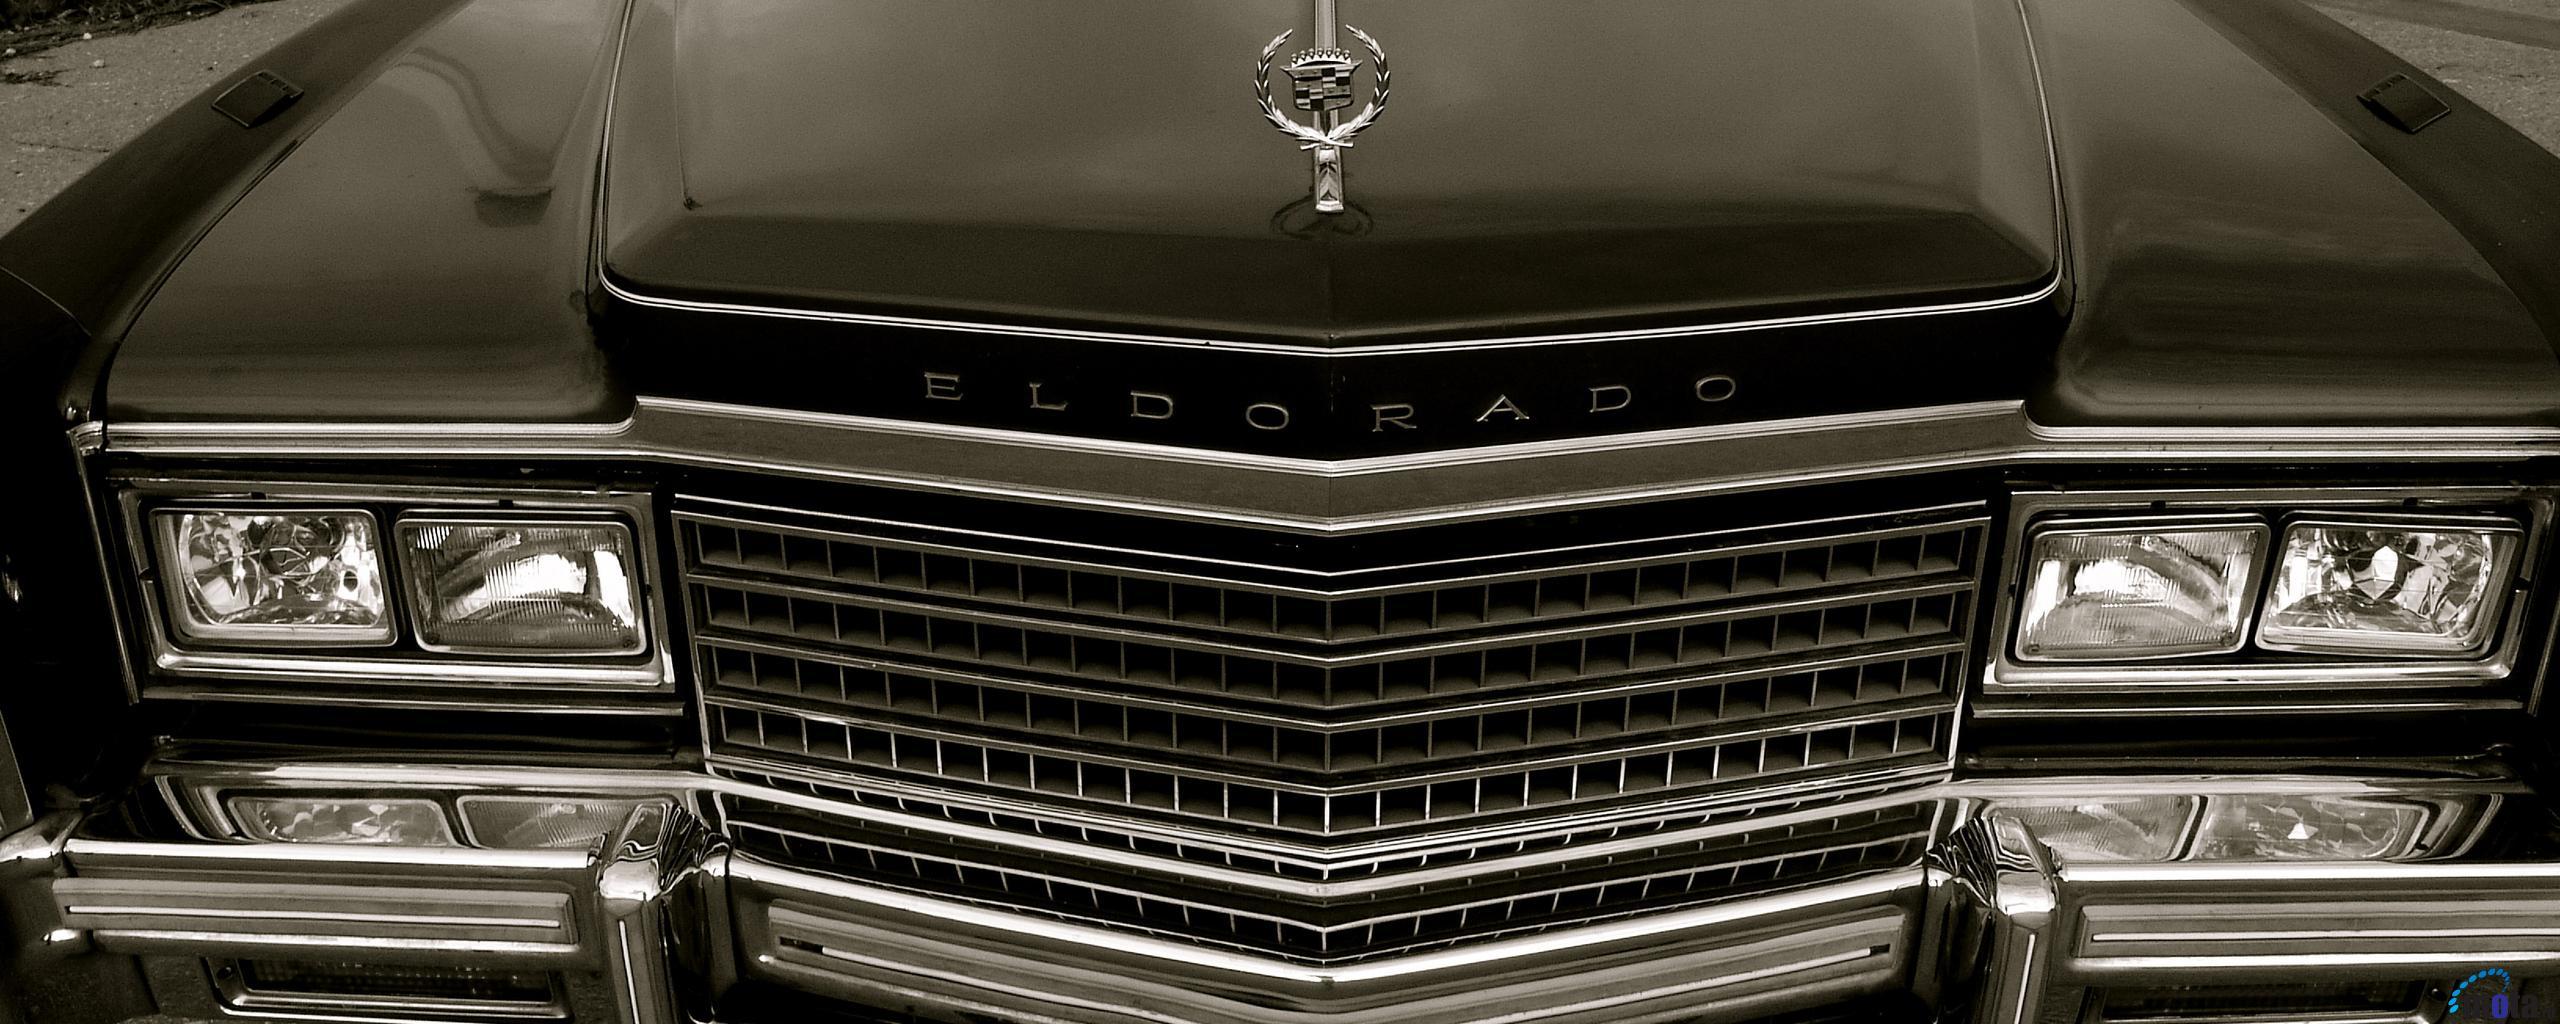 Wallpaper Luxury Car Cadillac Eldorado 2560 x 1024 Dual Monitor 2560x1024